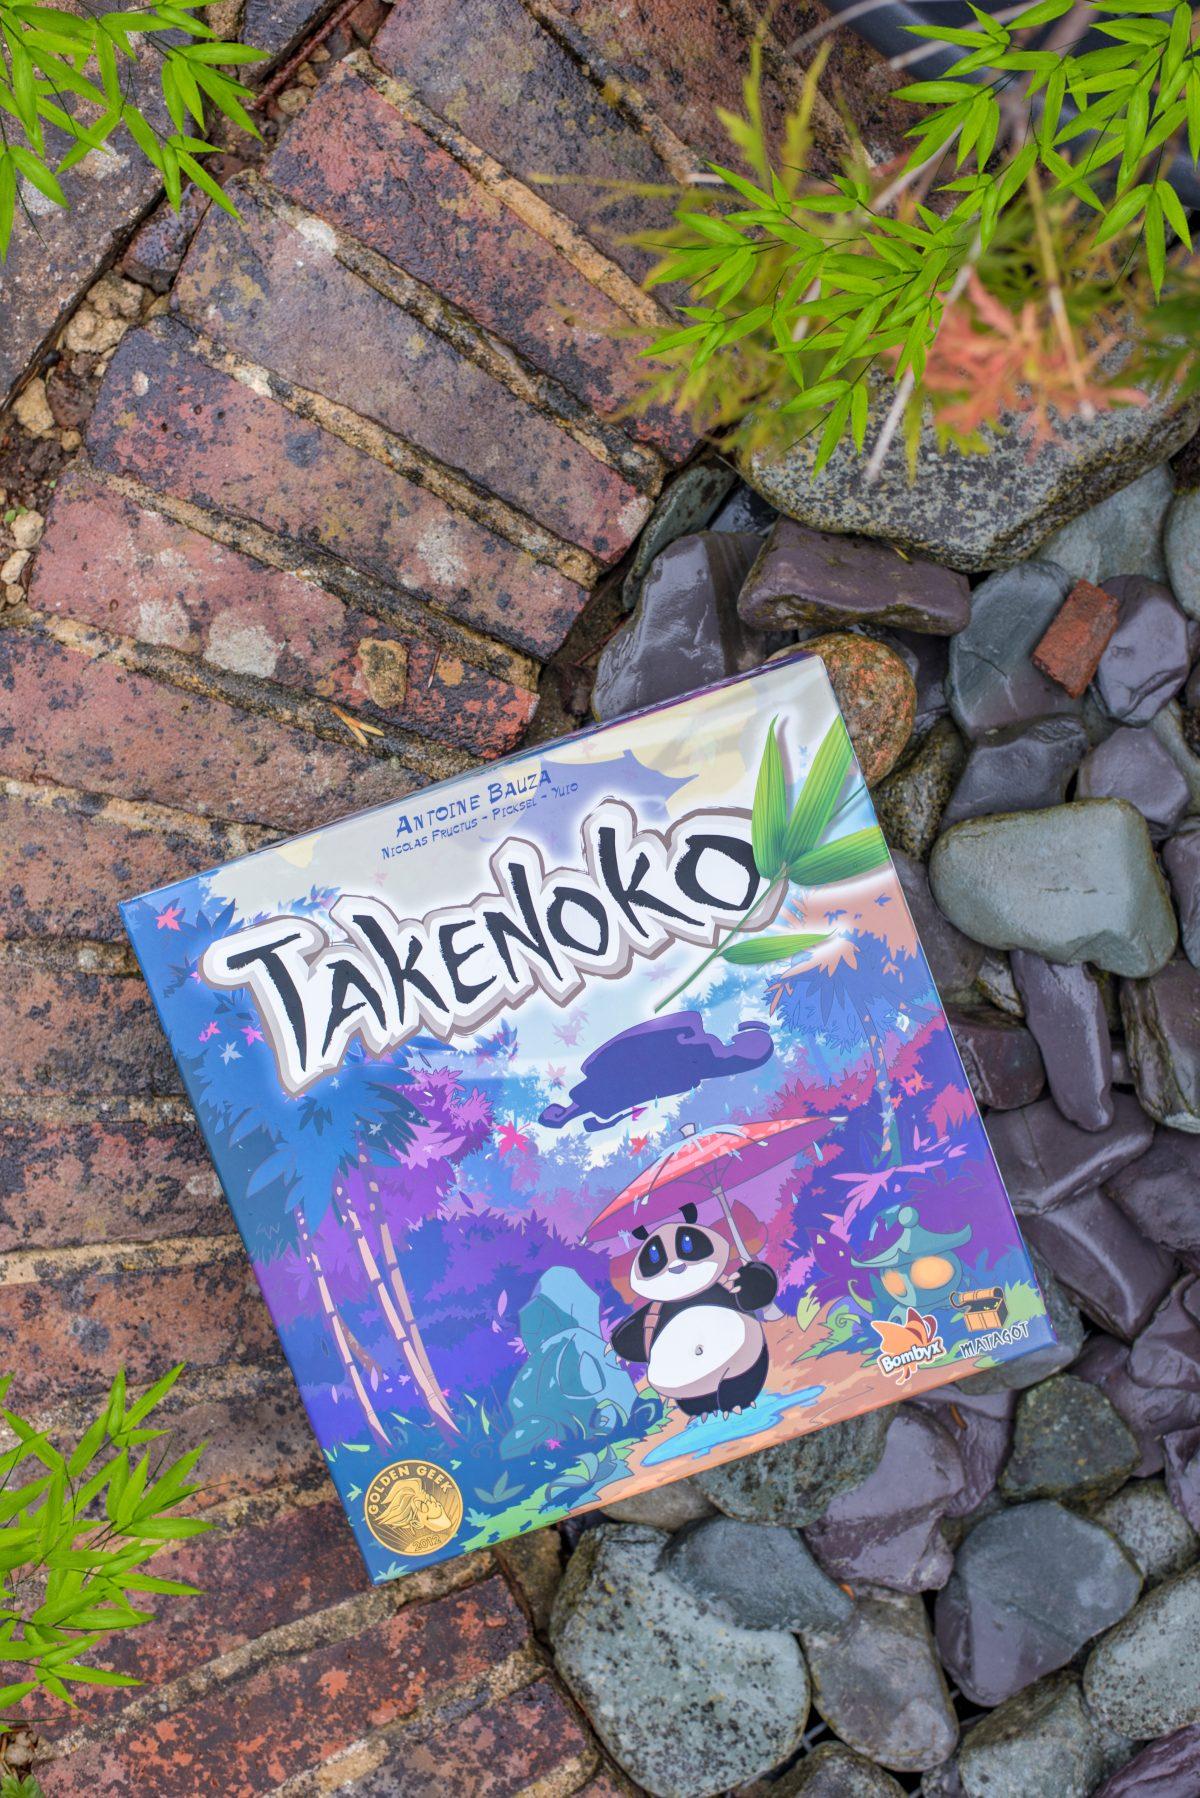 takenoko box cover